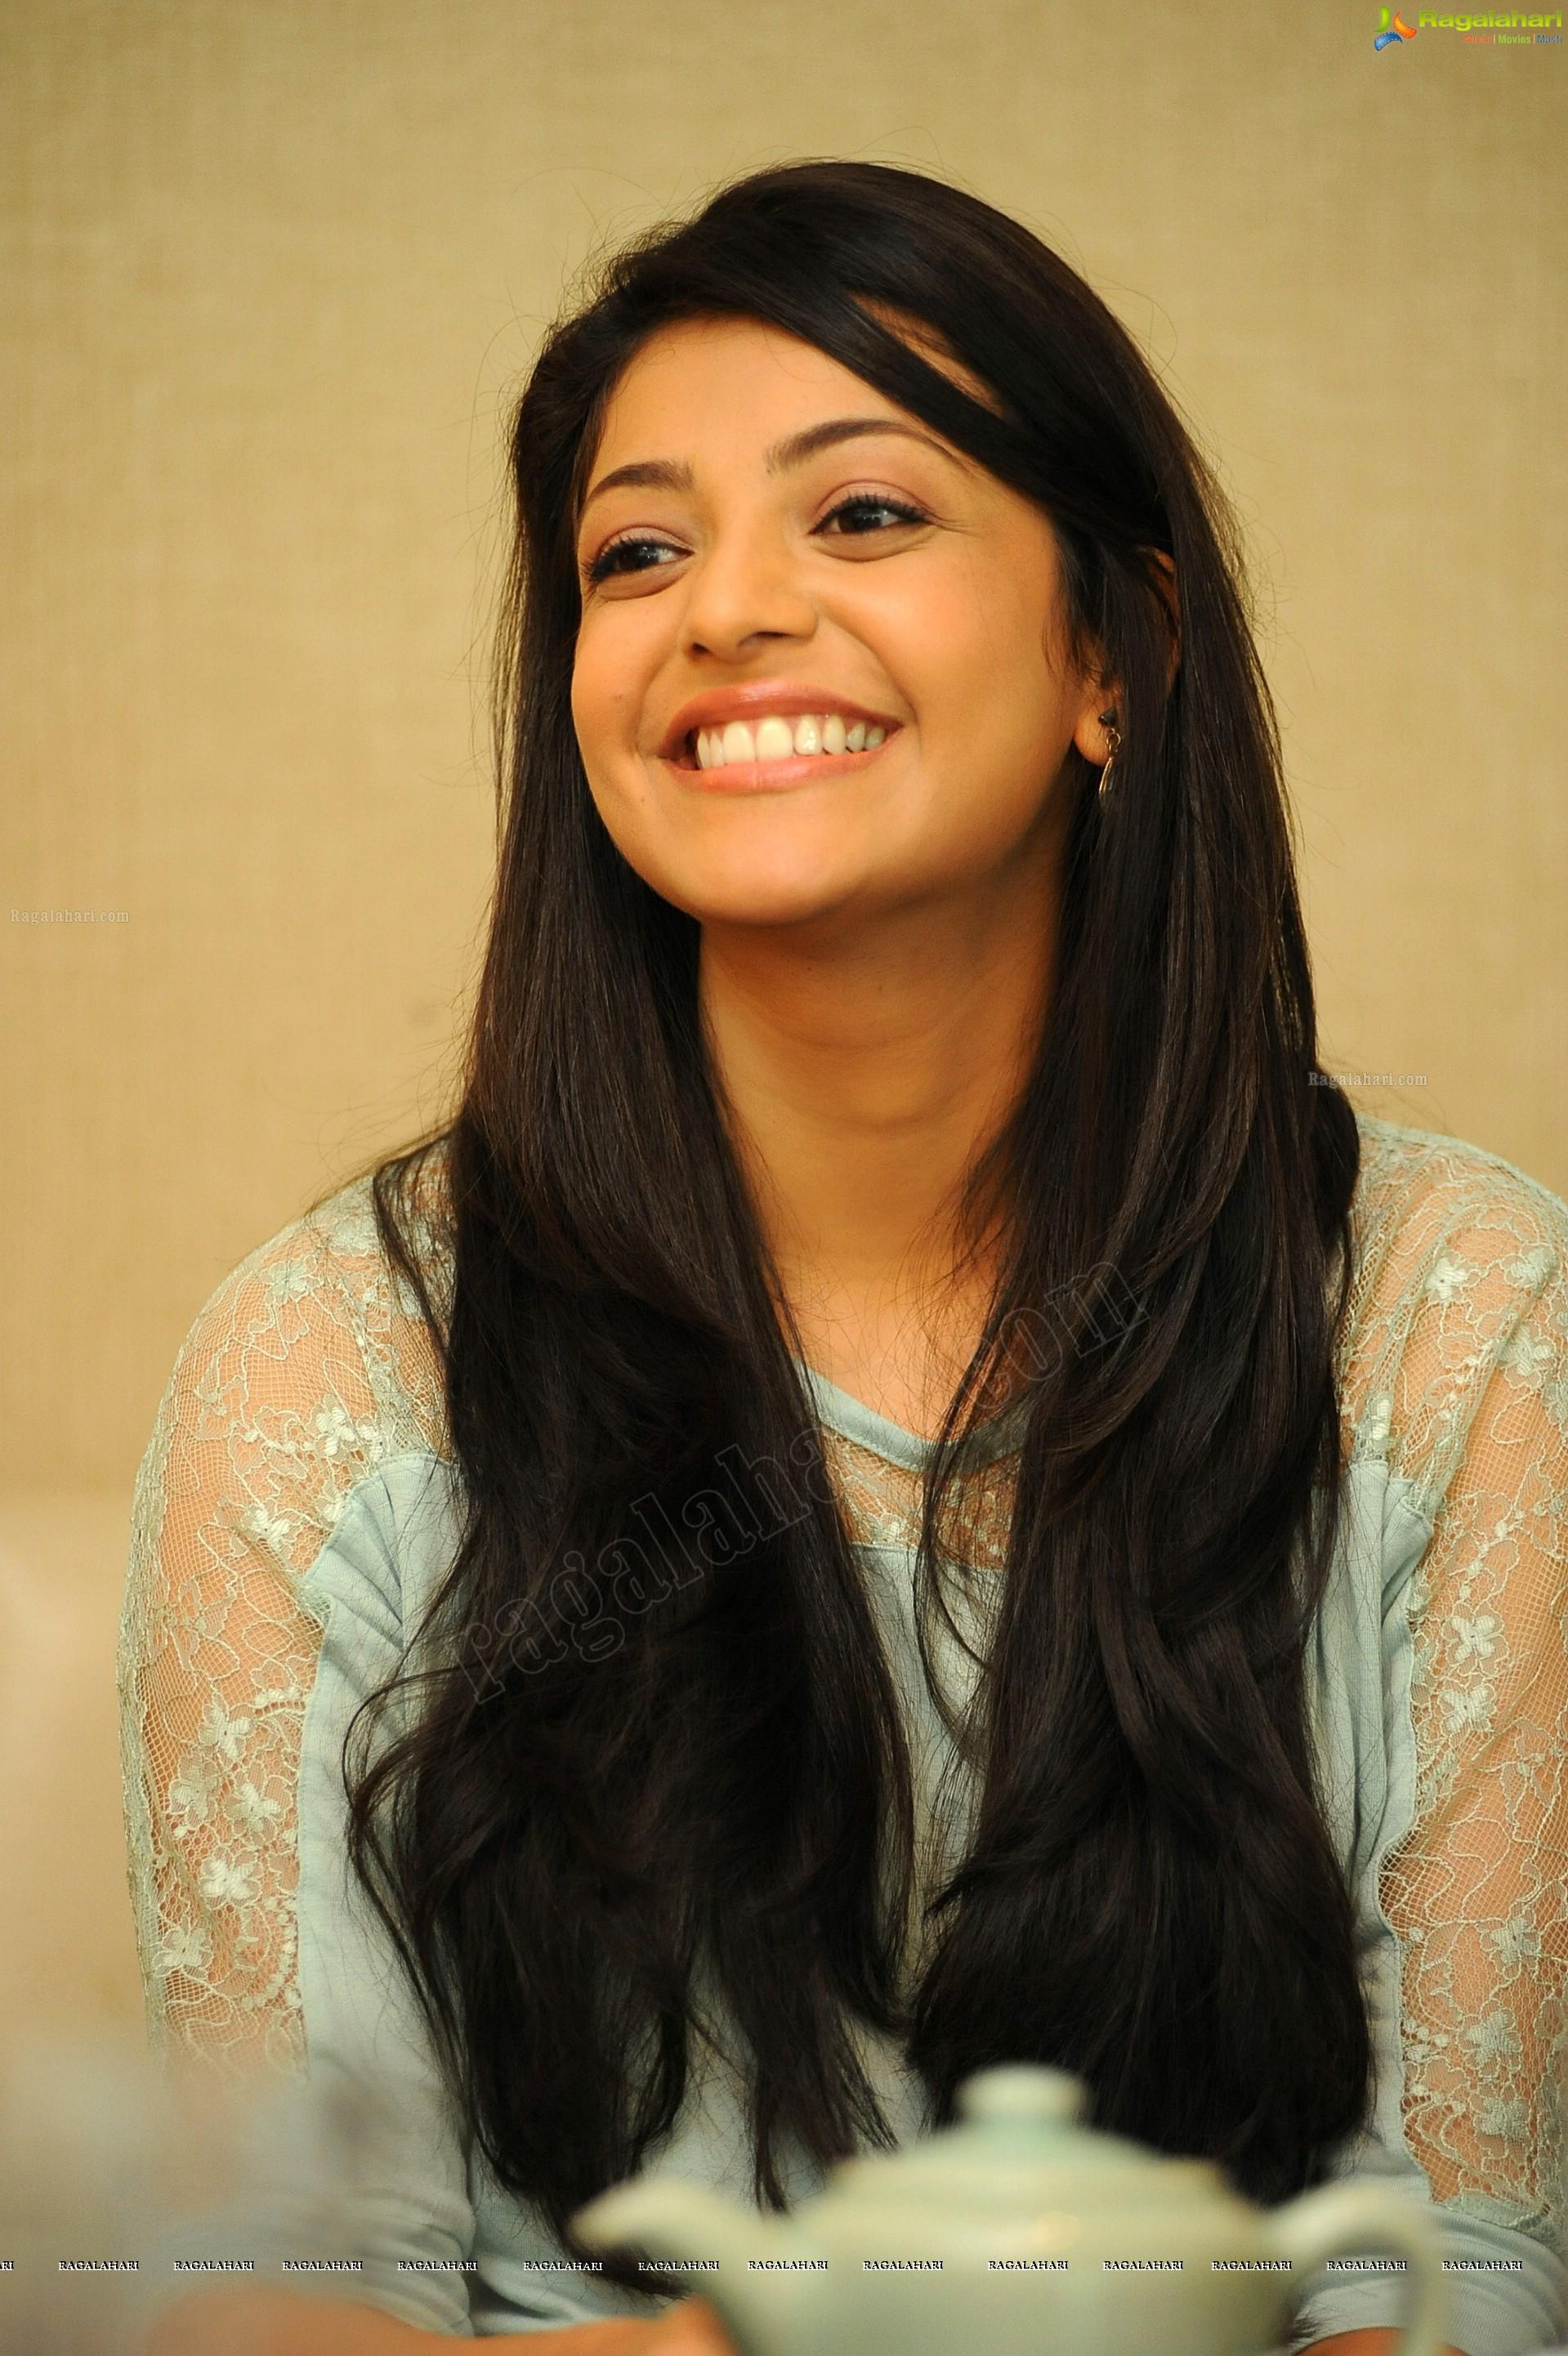 kajal agarwal (hd) image 14 | tollywood actress photos,images